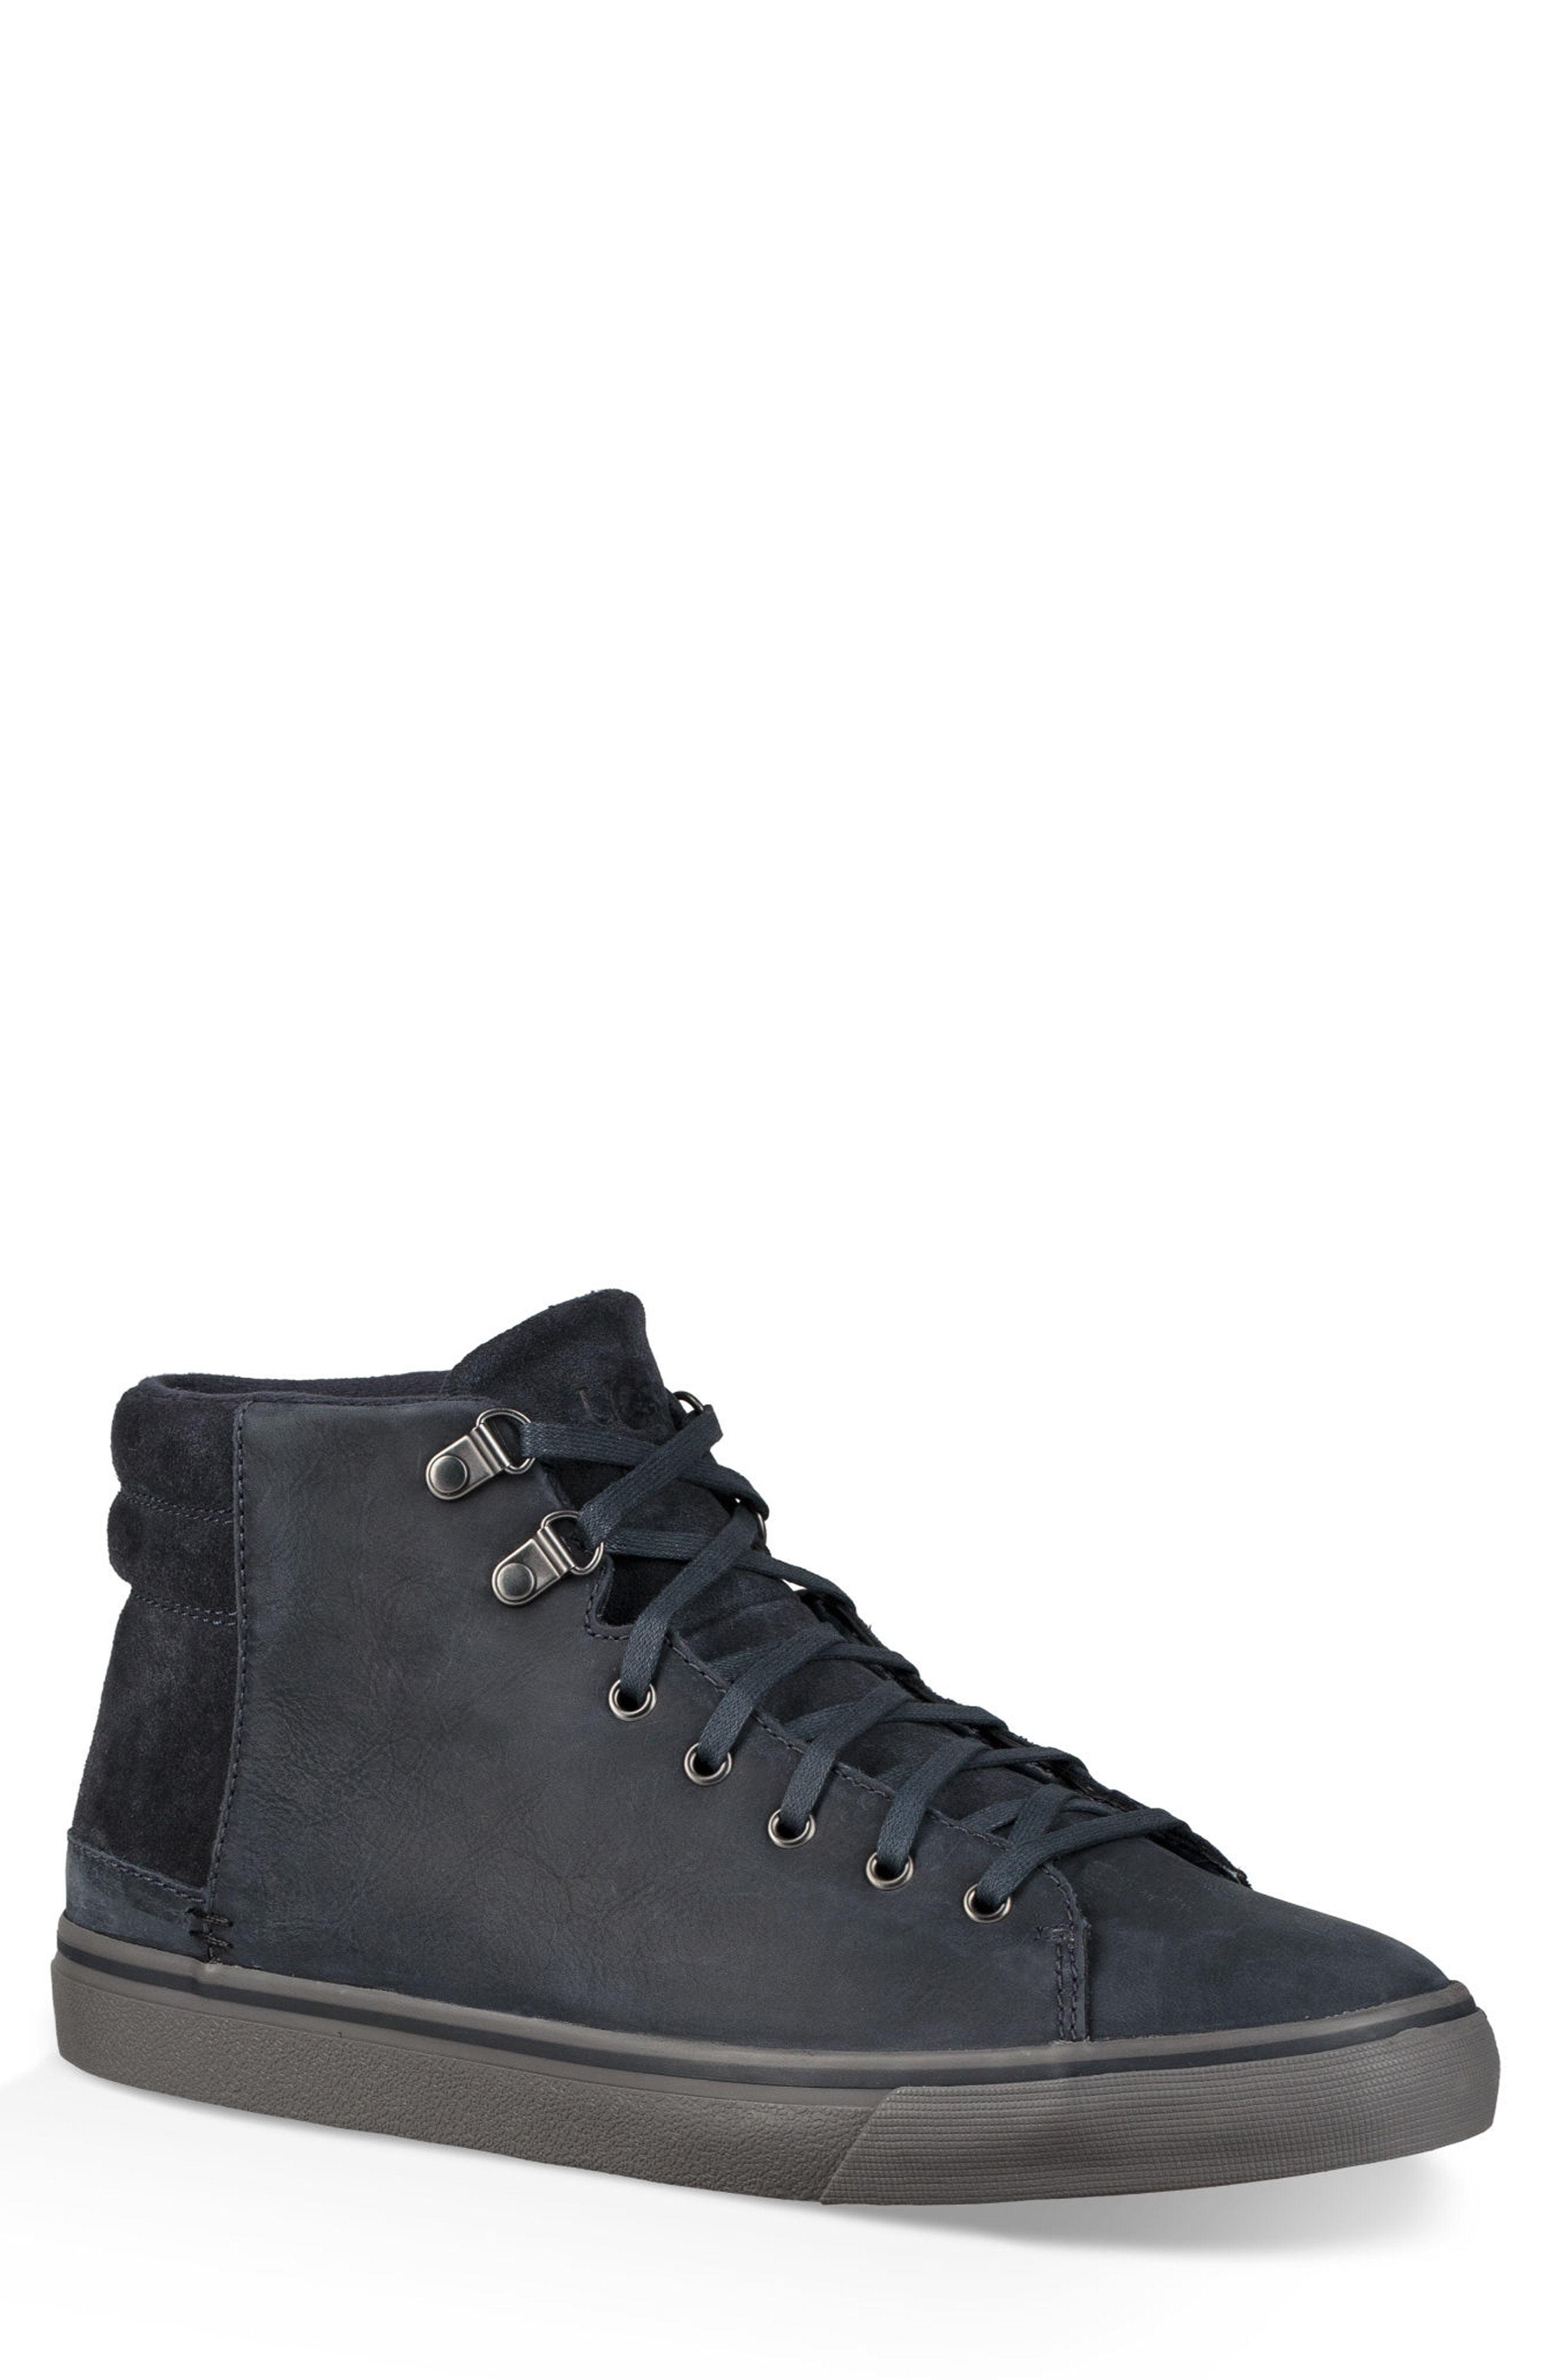 UGG Hoyt Ii Waterproof Sneaker, $119